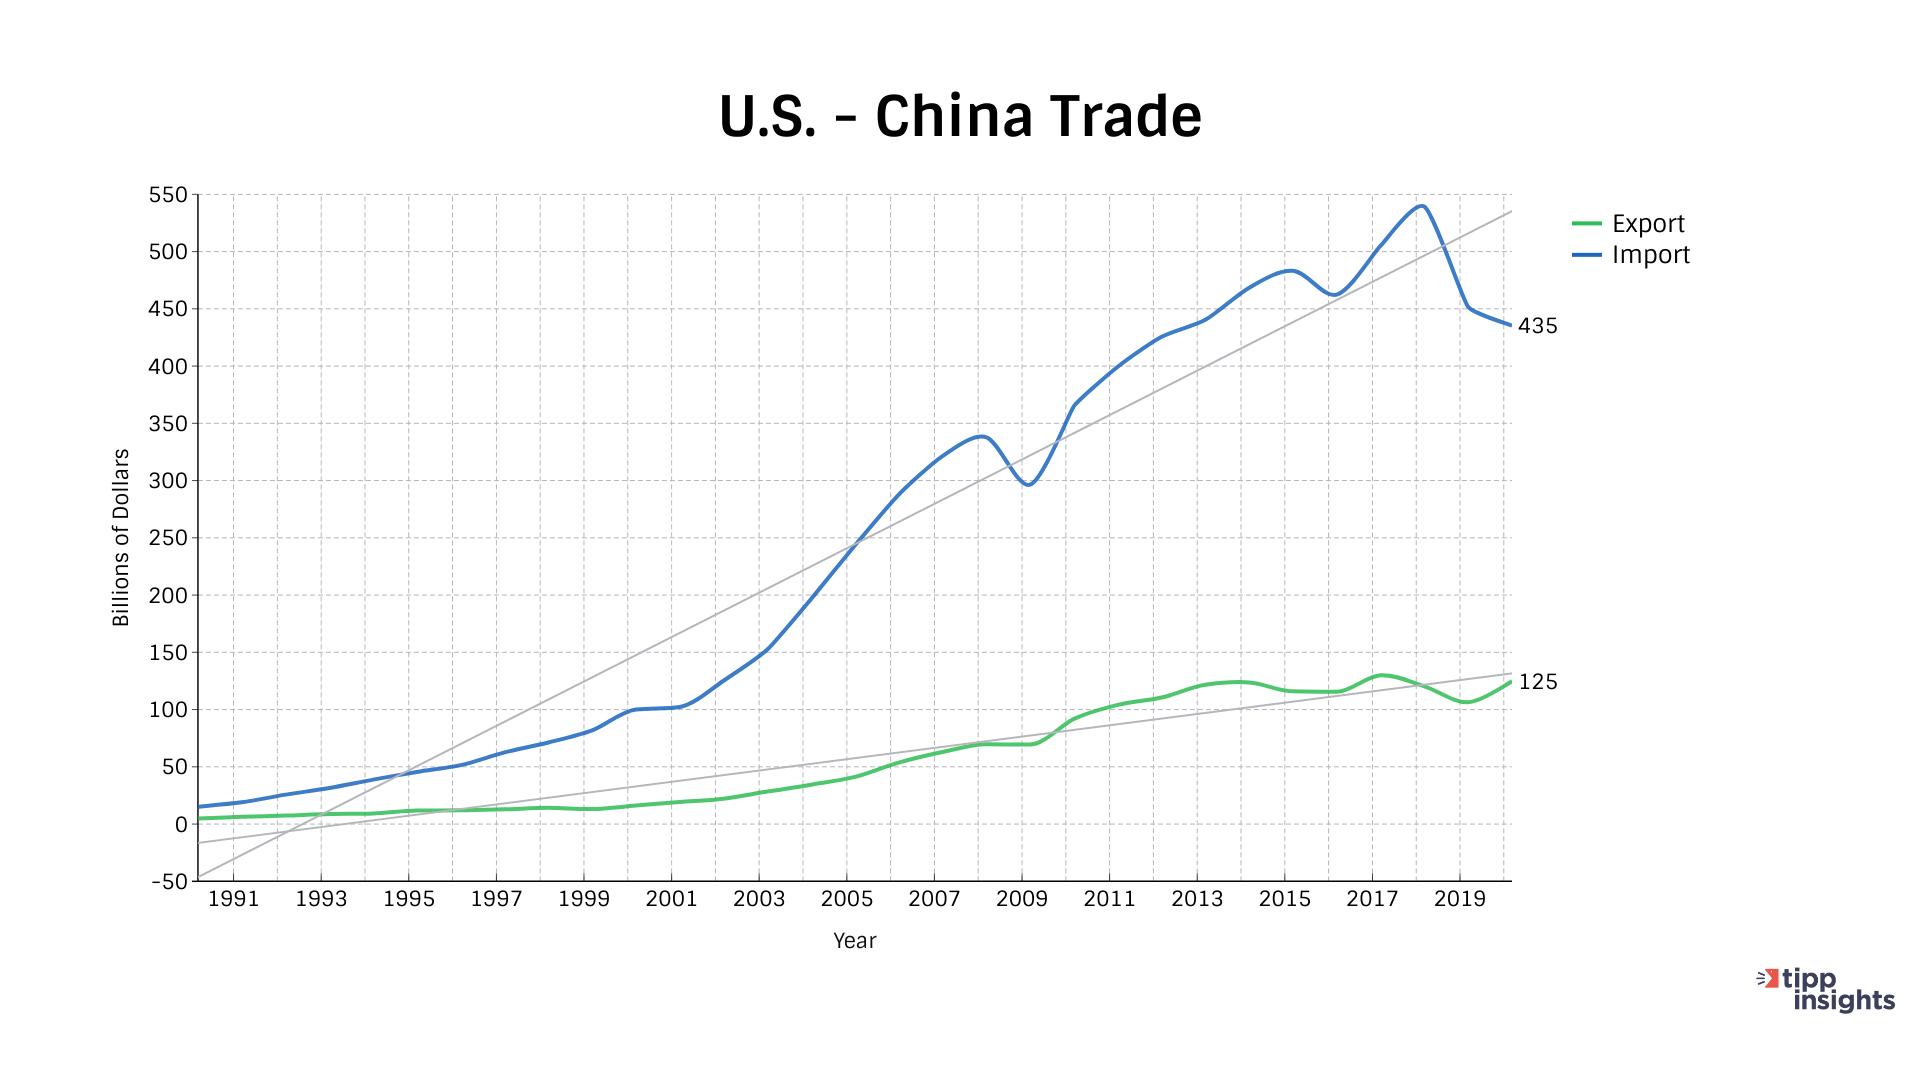 US China Trade Graph from 1991-2020